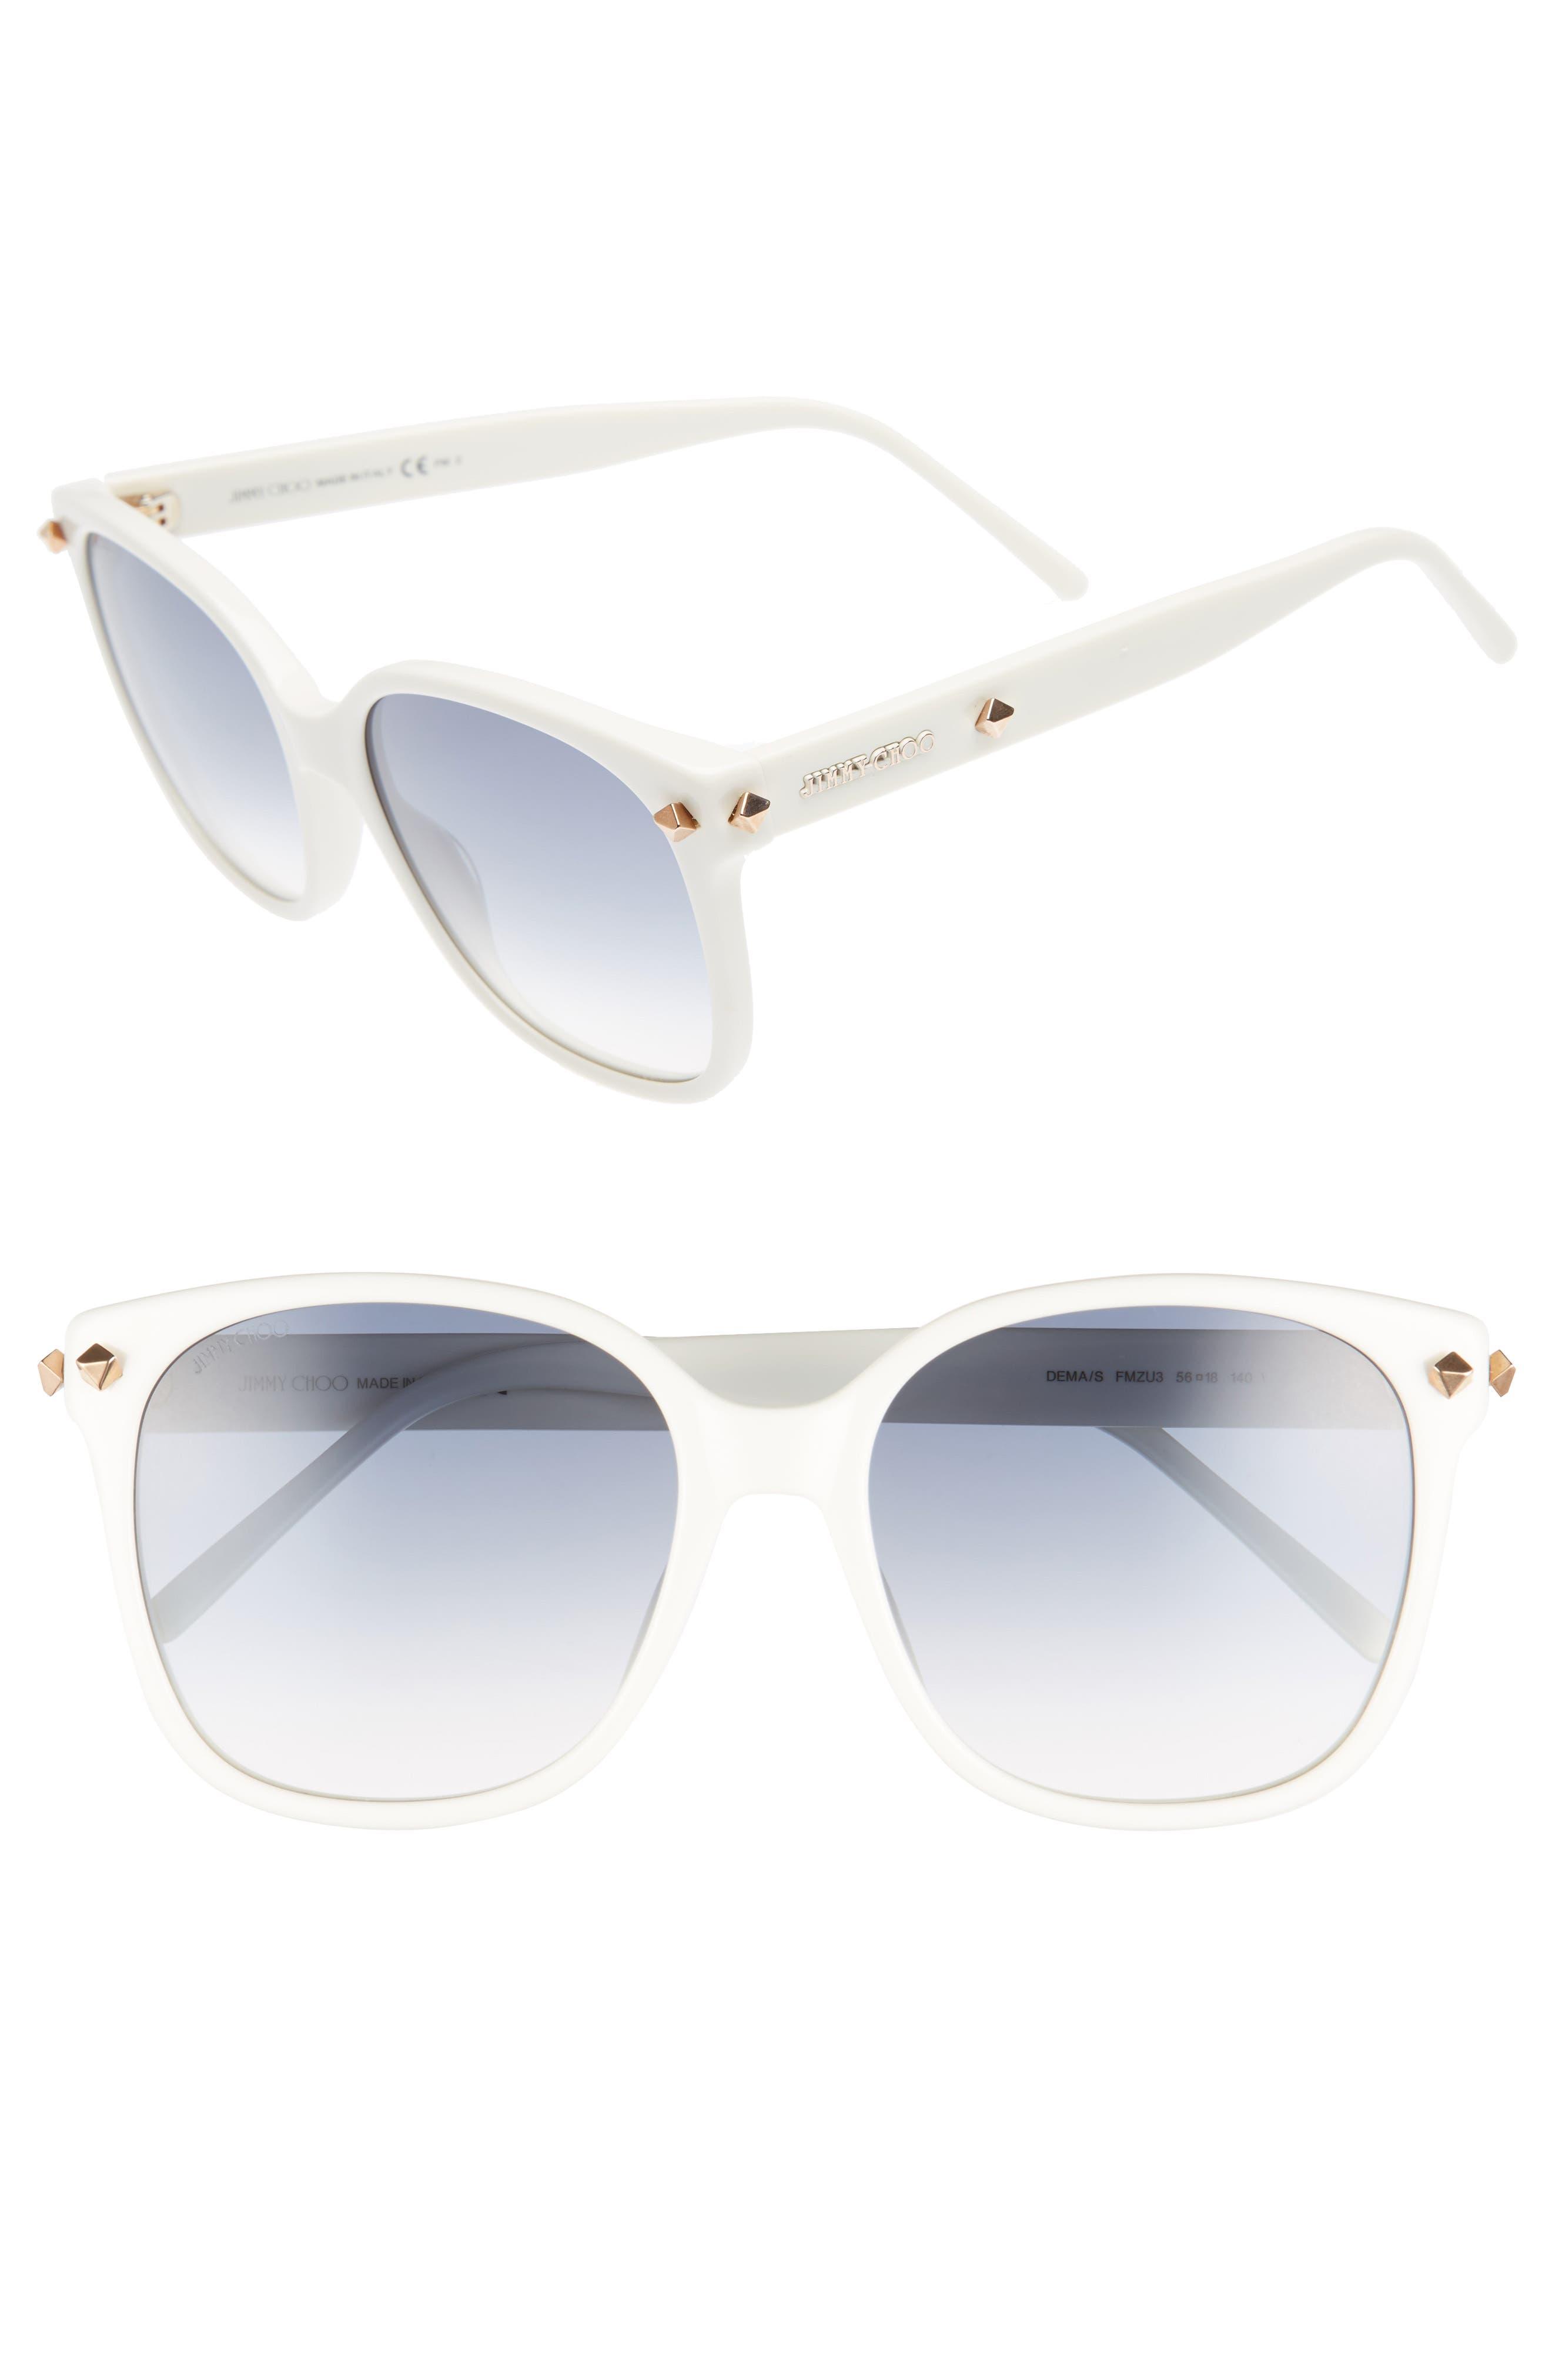 Demas 56mm Sunglasses,                             Main thumbnail 2, color,